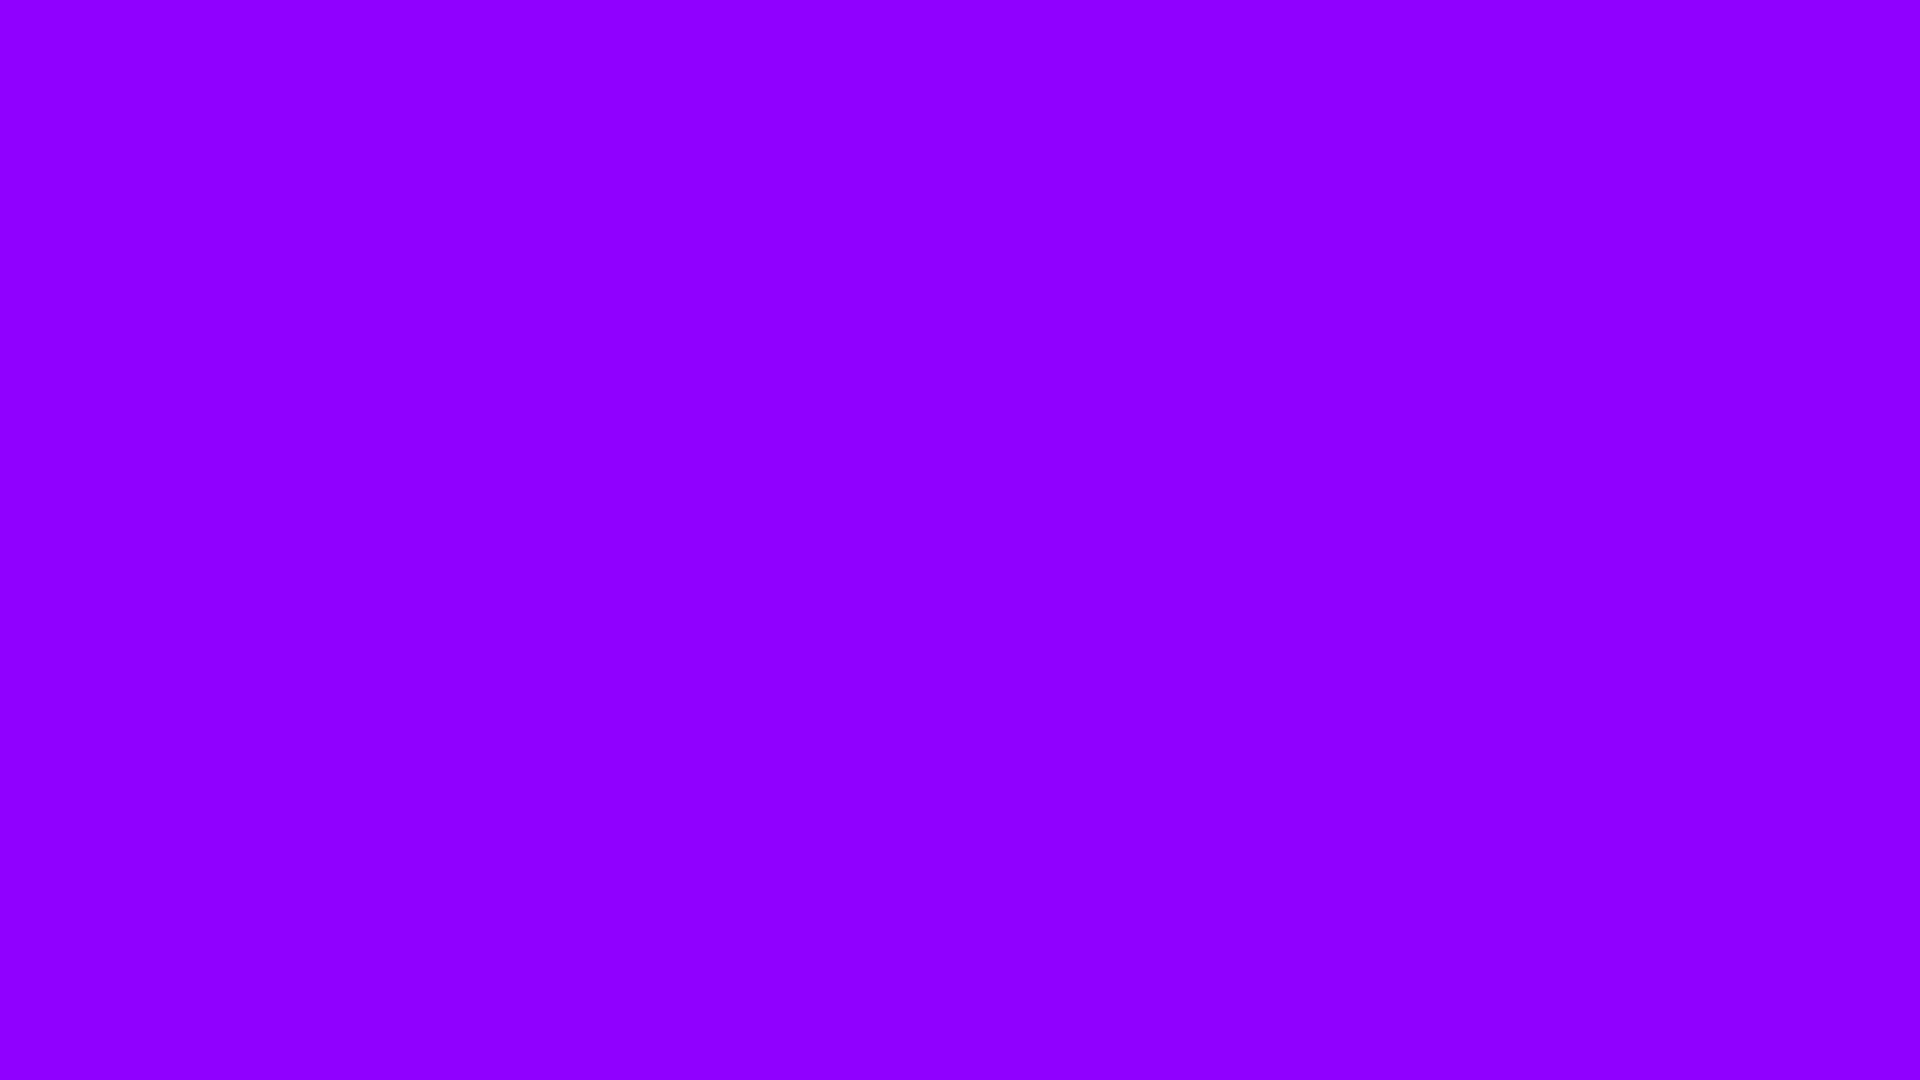 1920x1080 Violet Solid Color Background 1920x1080